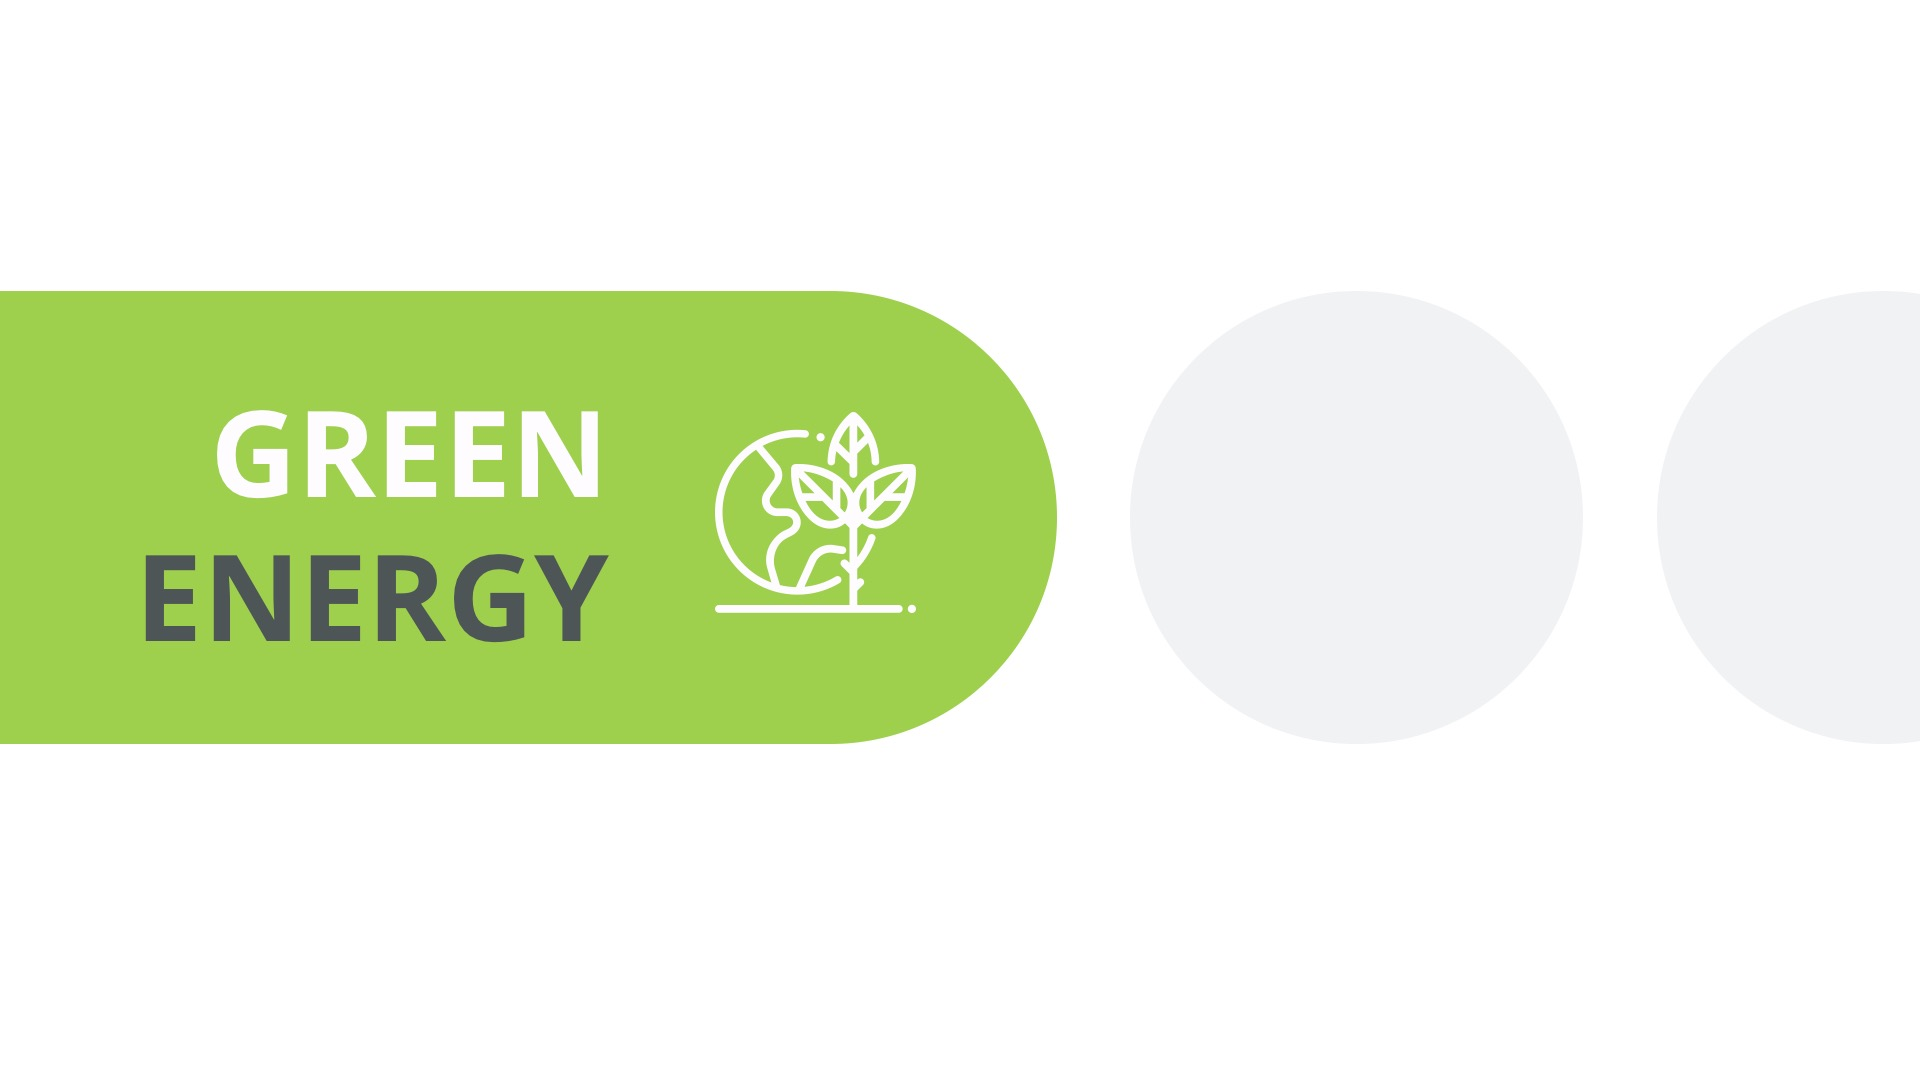 Green energy powerpoint template by site2max graphicriver green energy powerpoint template nature powerpoint templates slide01g slide02g slide03g slide04g toneelgroepblik Choice Image